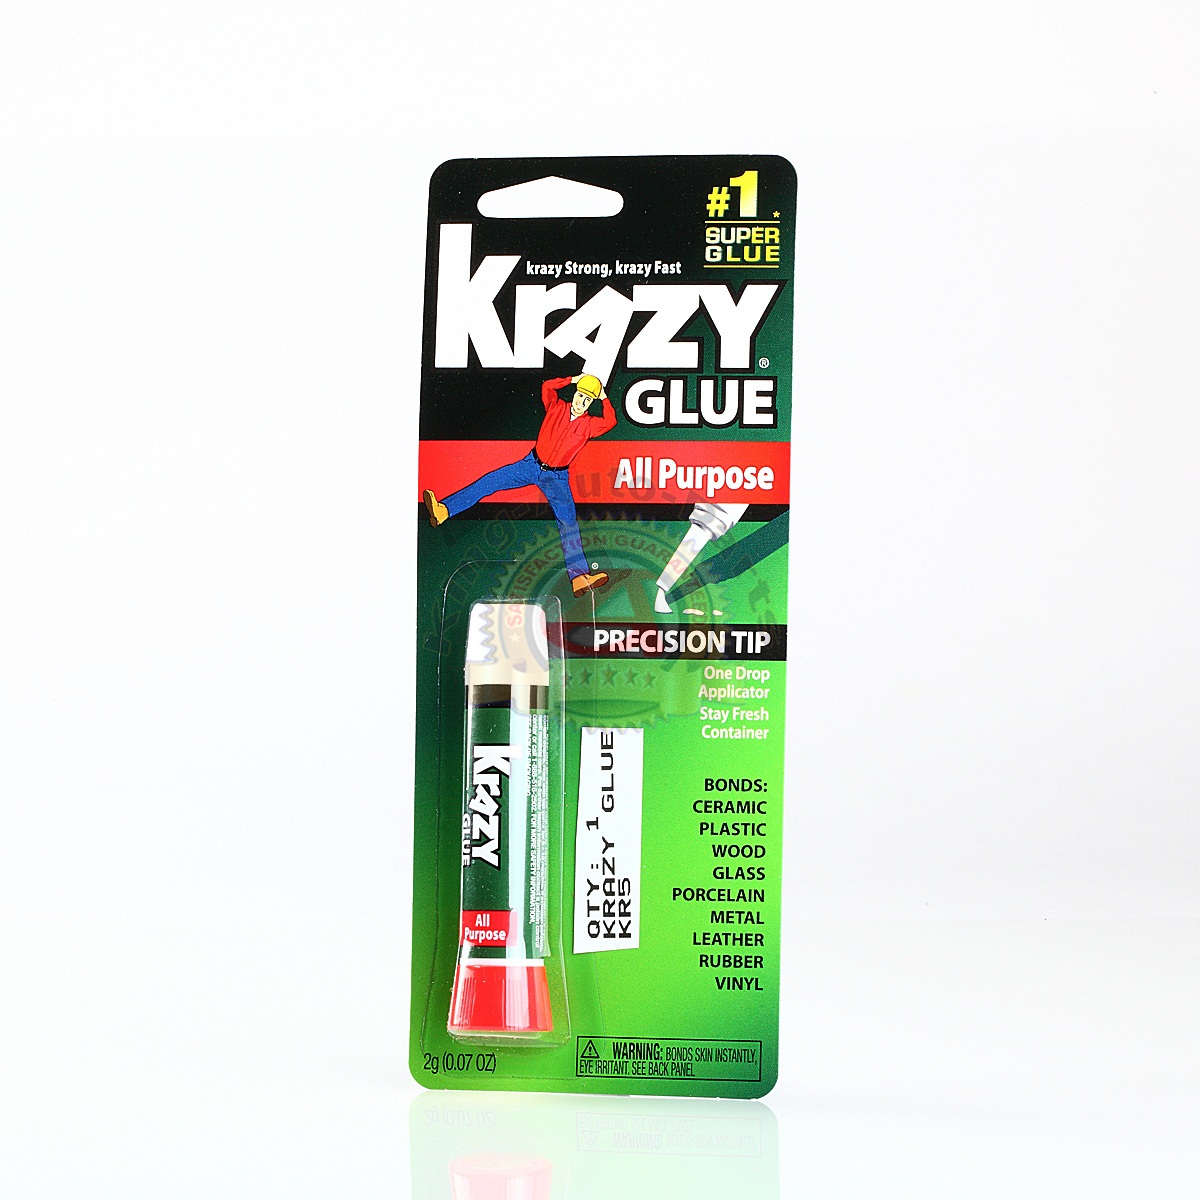 original krazy glue crazy super glue all purpose instant repair free shipping ebay. Black Bedroom Furniture Sets. Home Design Ideas